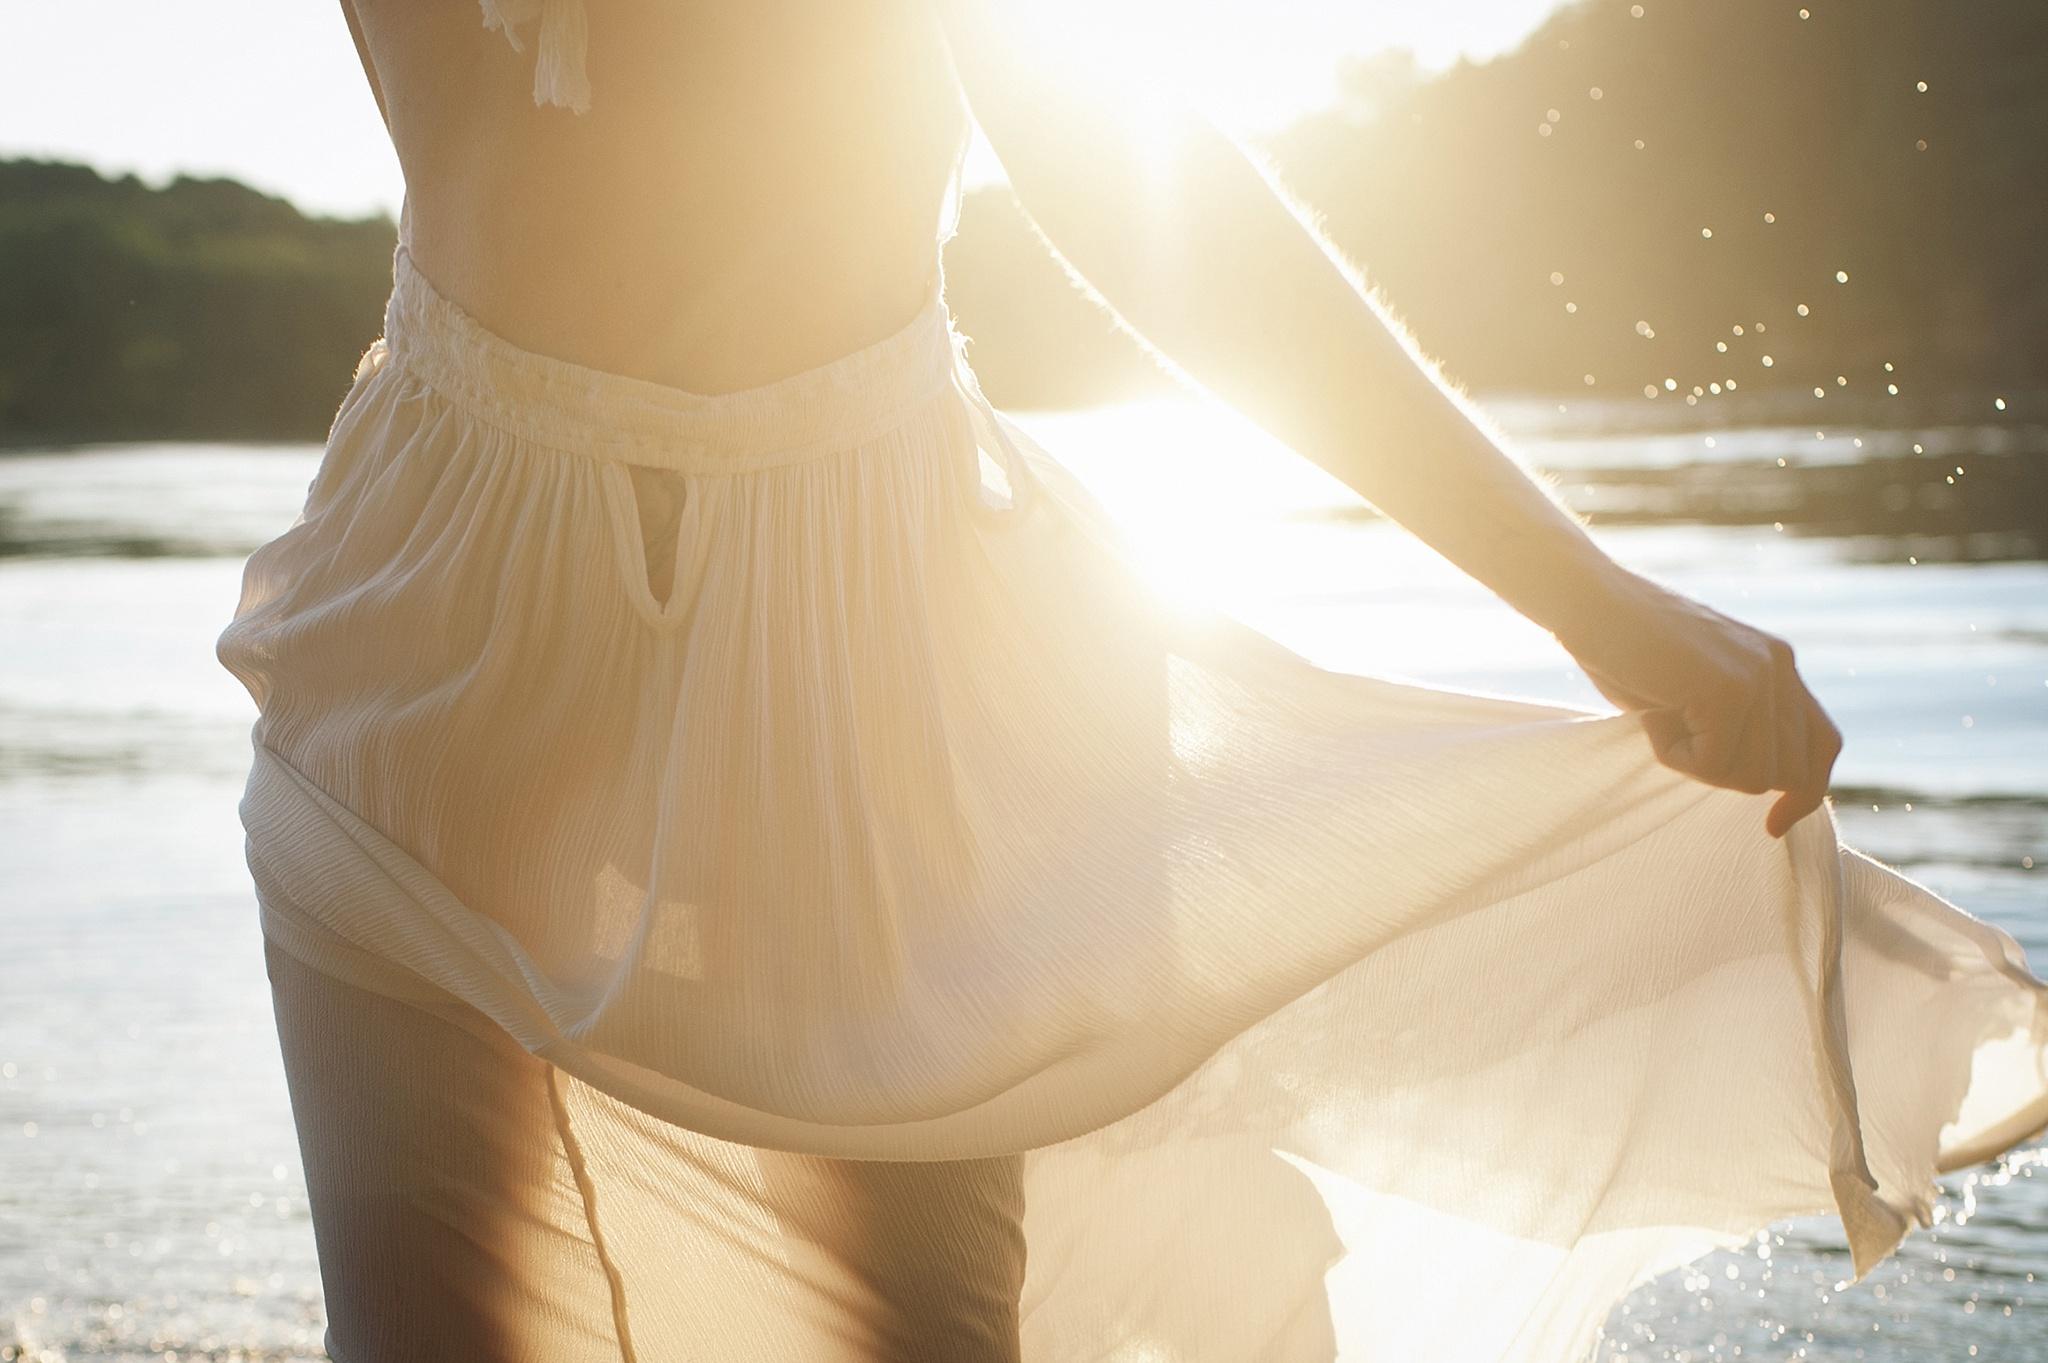 outdoor-boudoir-photographer-water_04.jpg